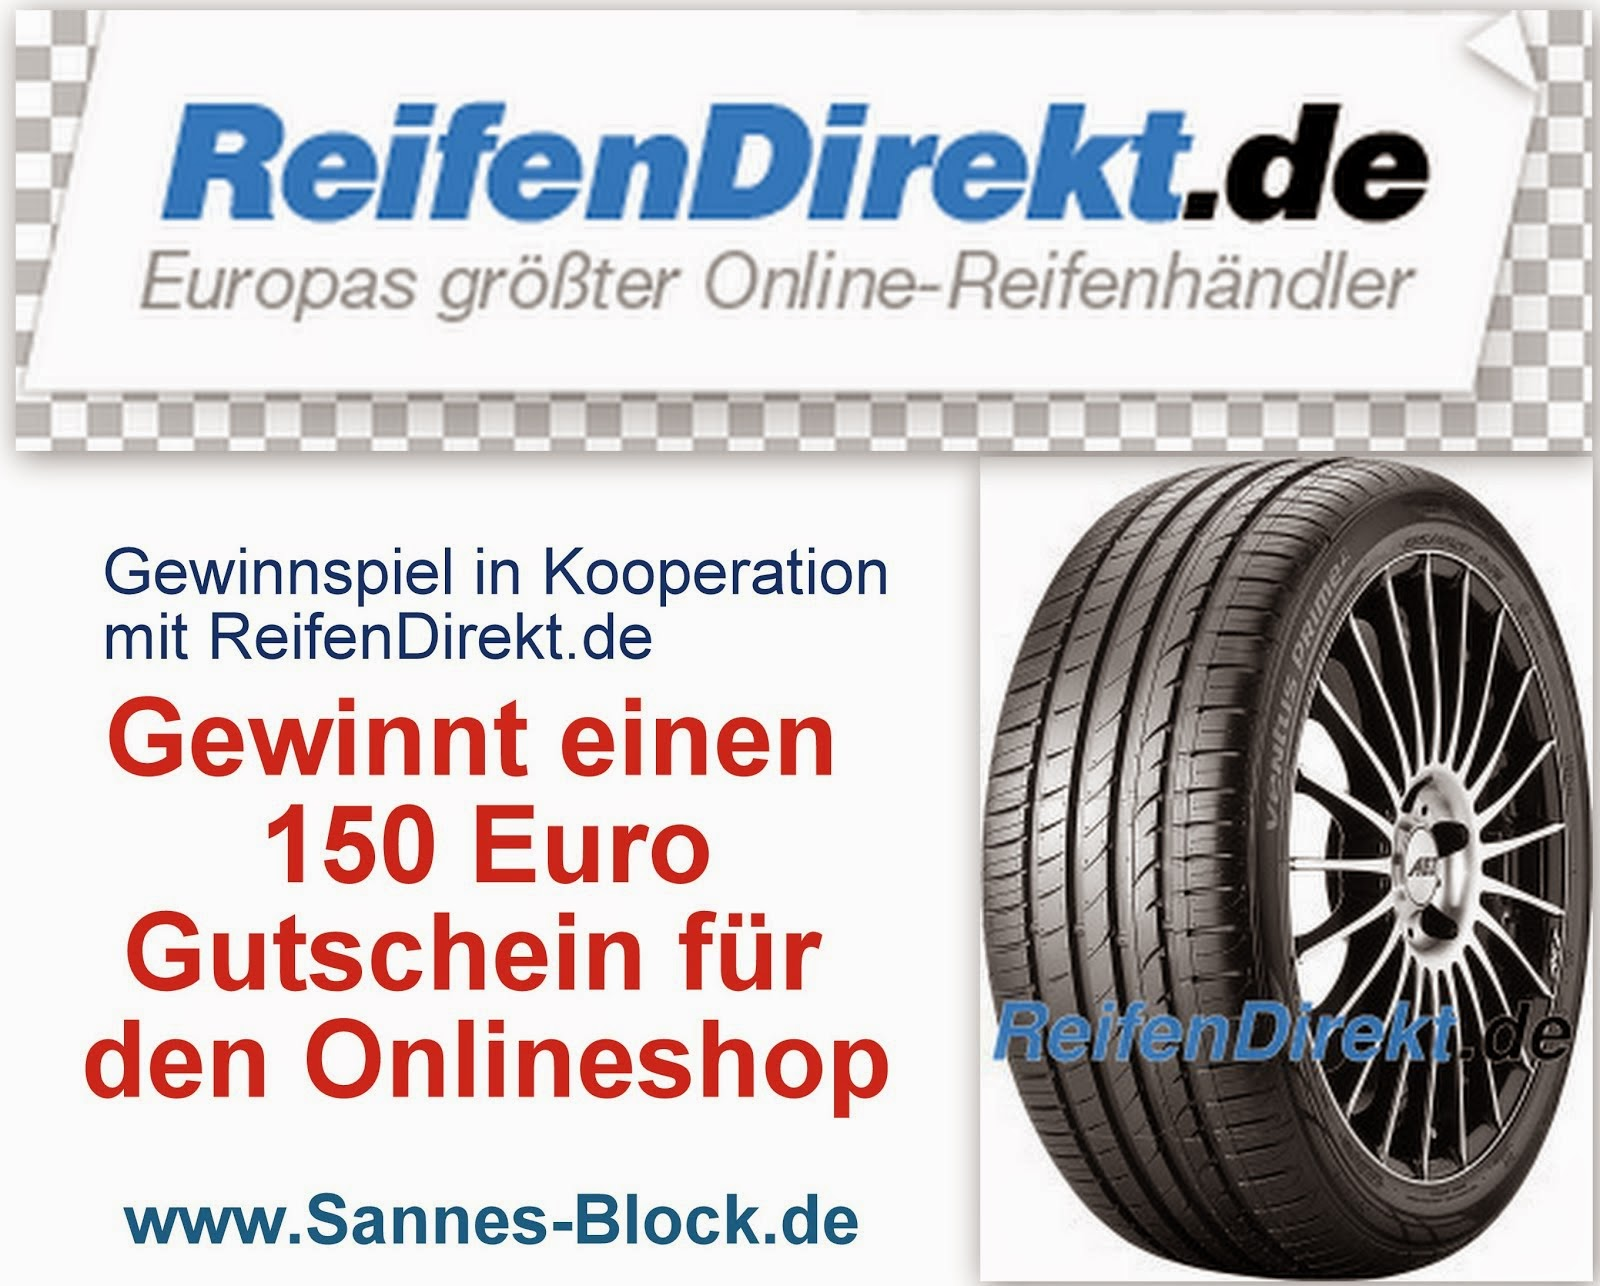 ReifenDirekt.de Gewinnspiel